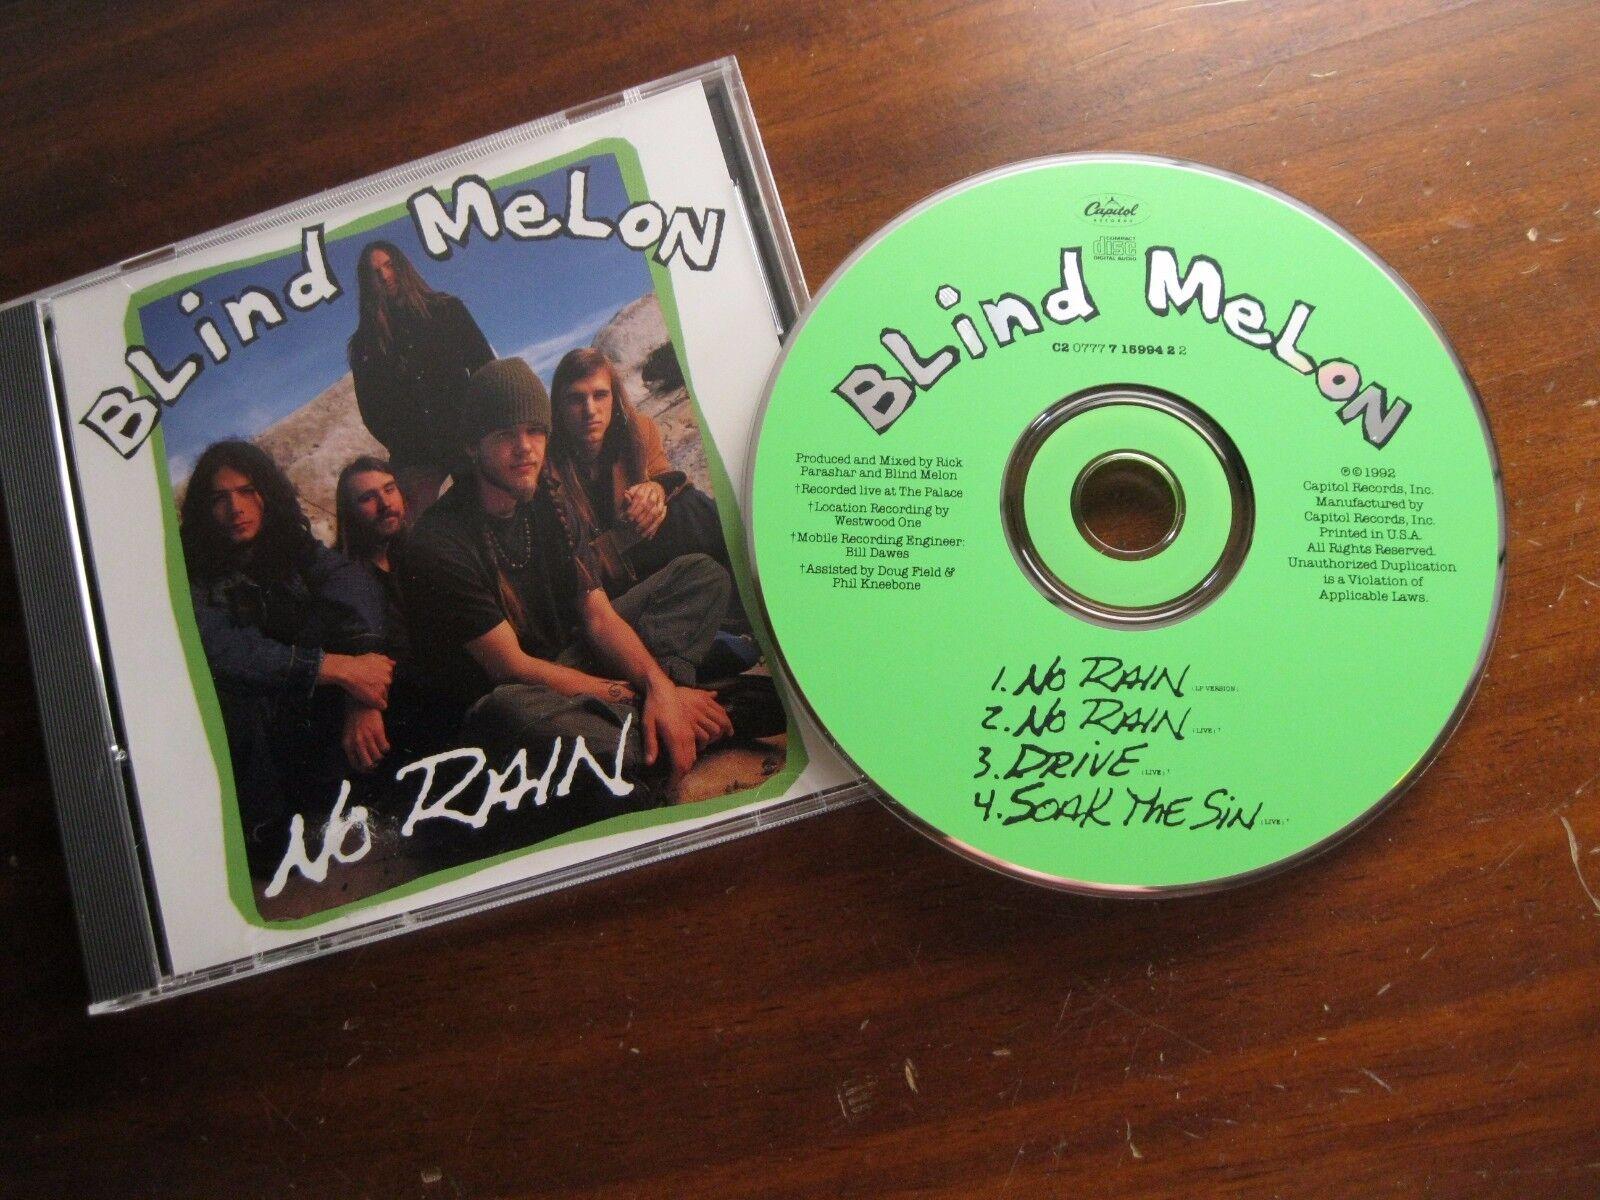 No Rain [CD Single] [Maxi Single] by Blind Melon (CD, Aug-1993, Capitol/EMI Reco